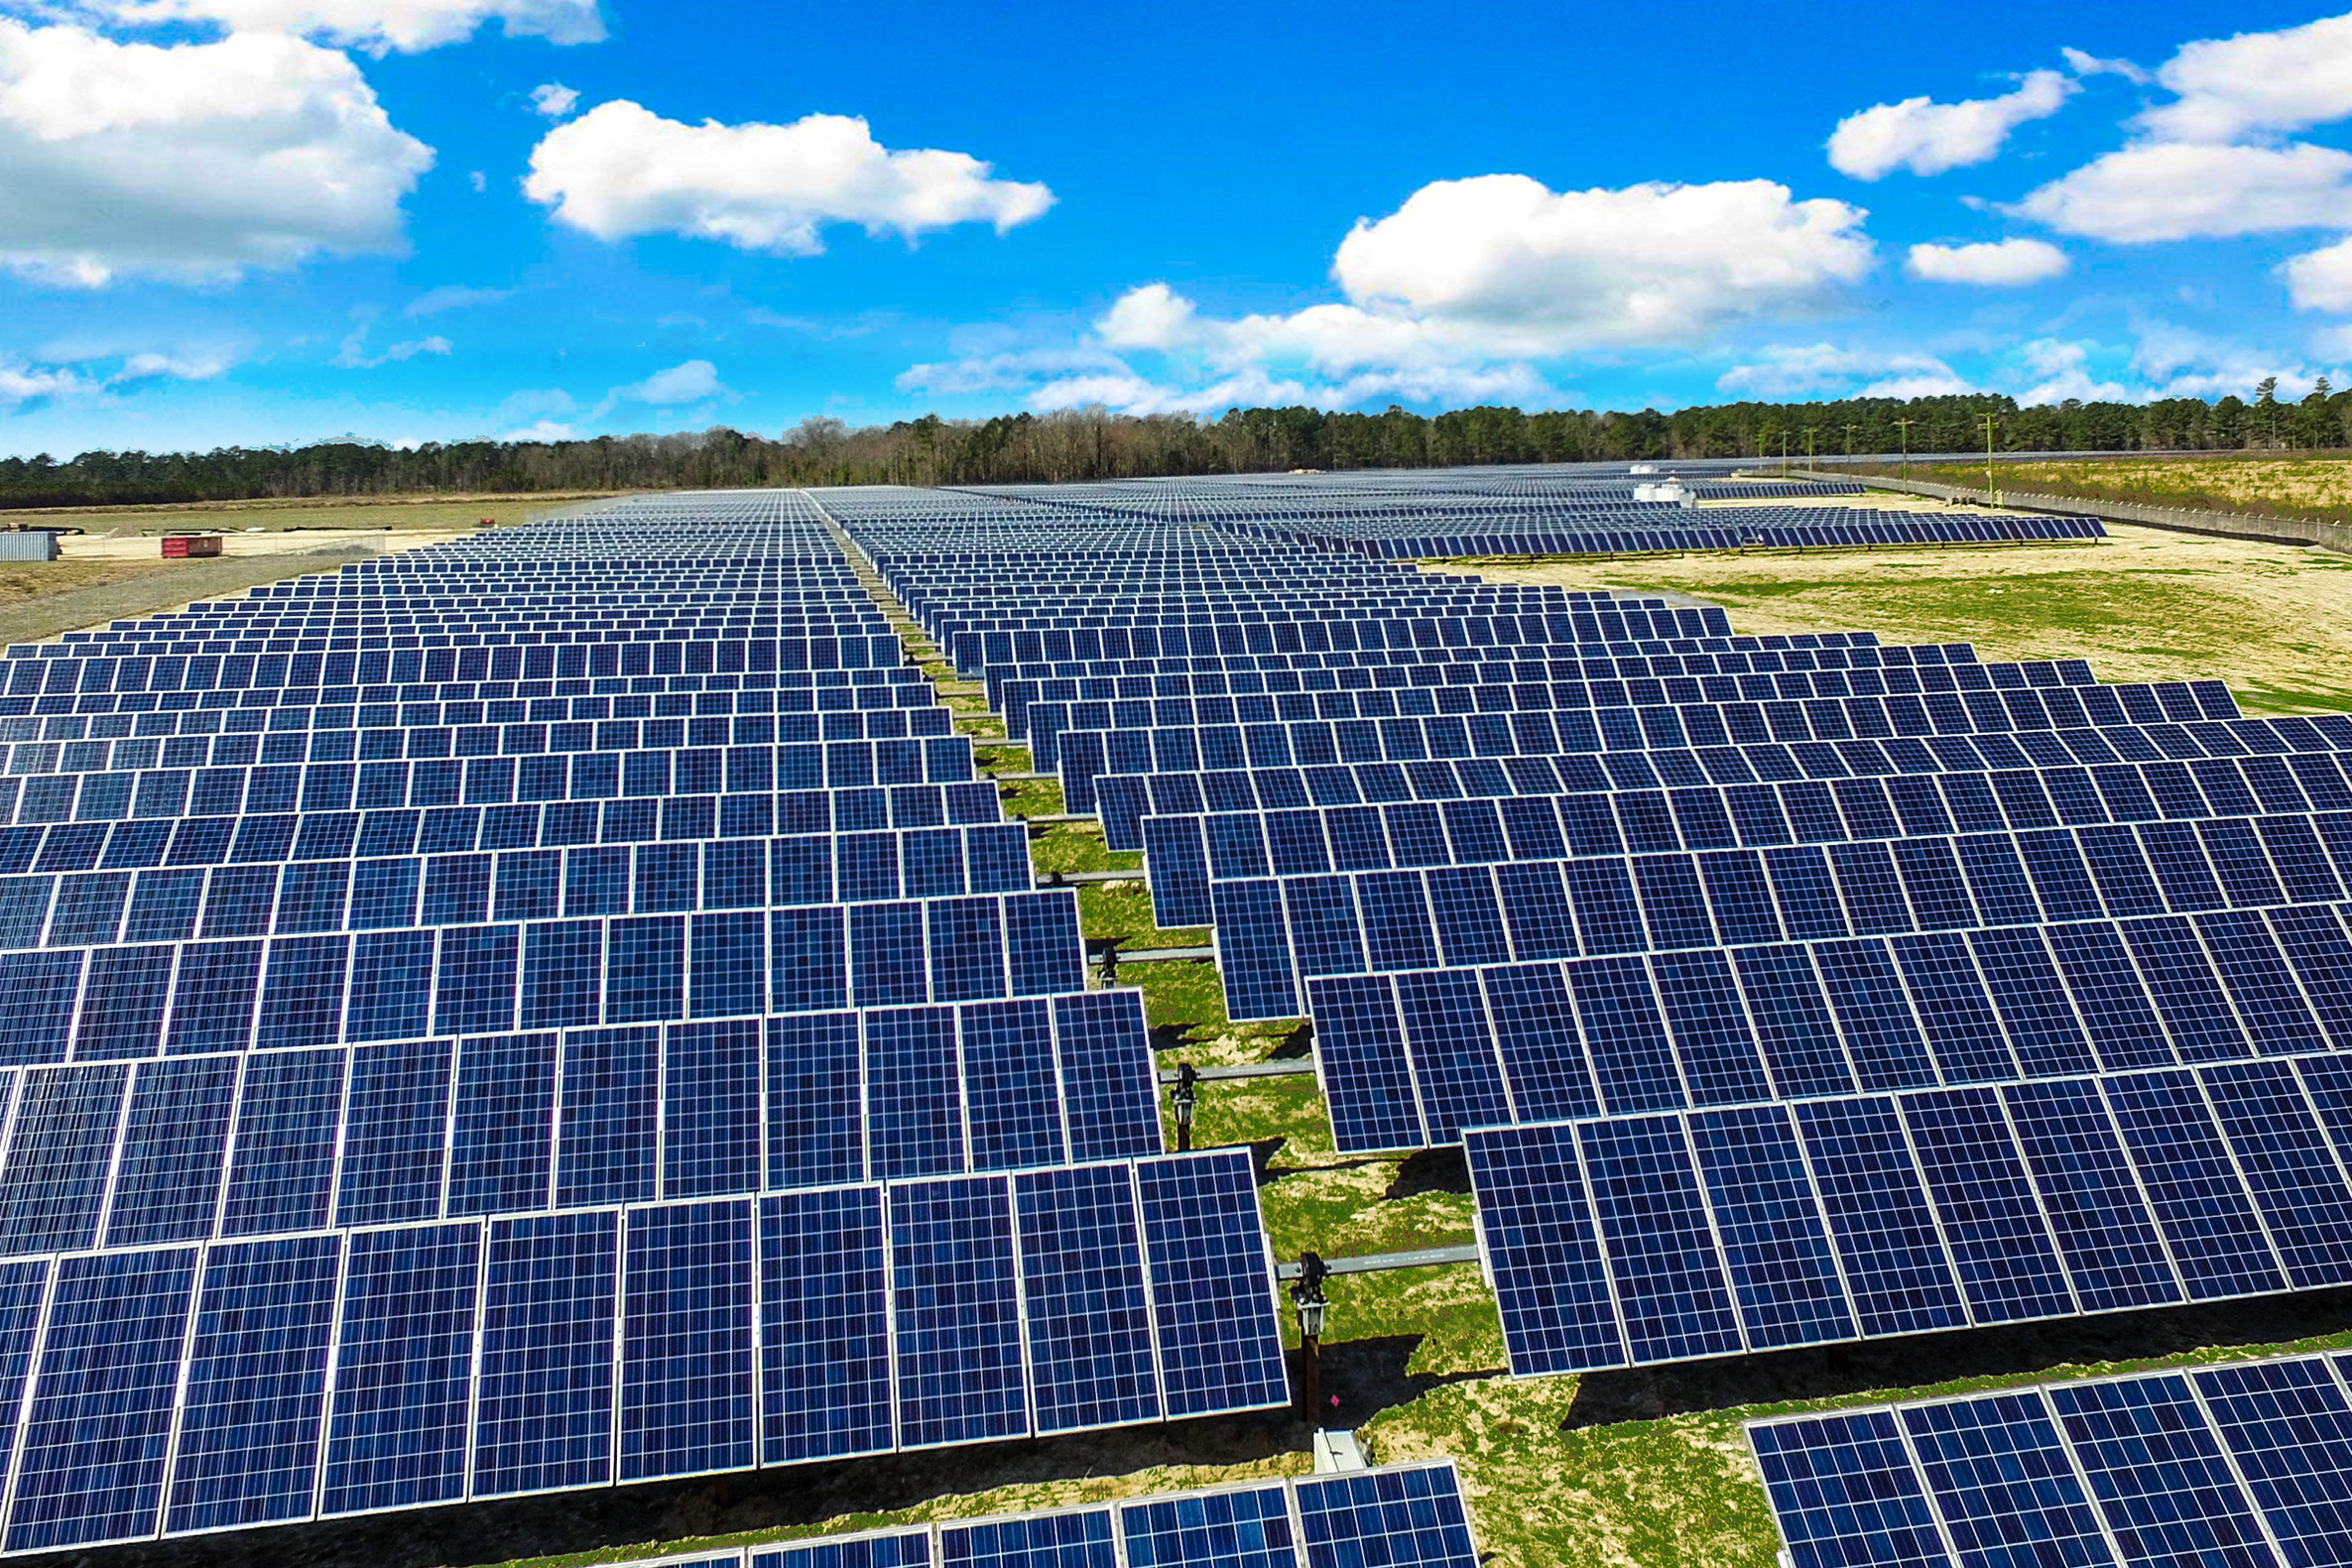 Building Unique Solar Panels Dispose Of The Grid